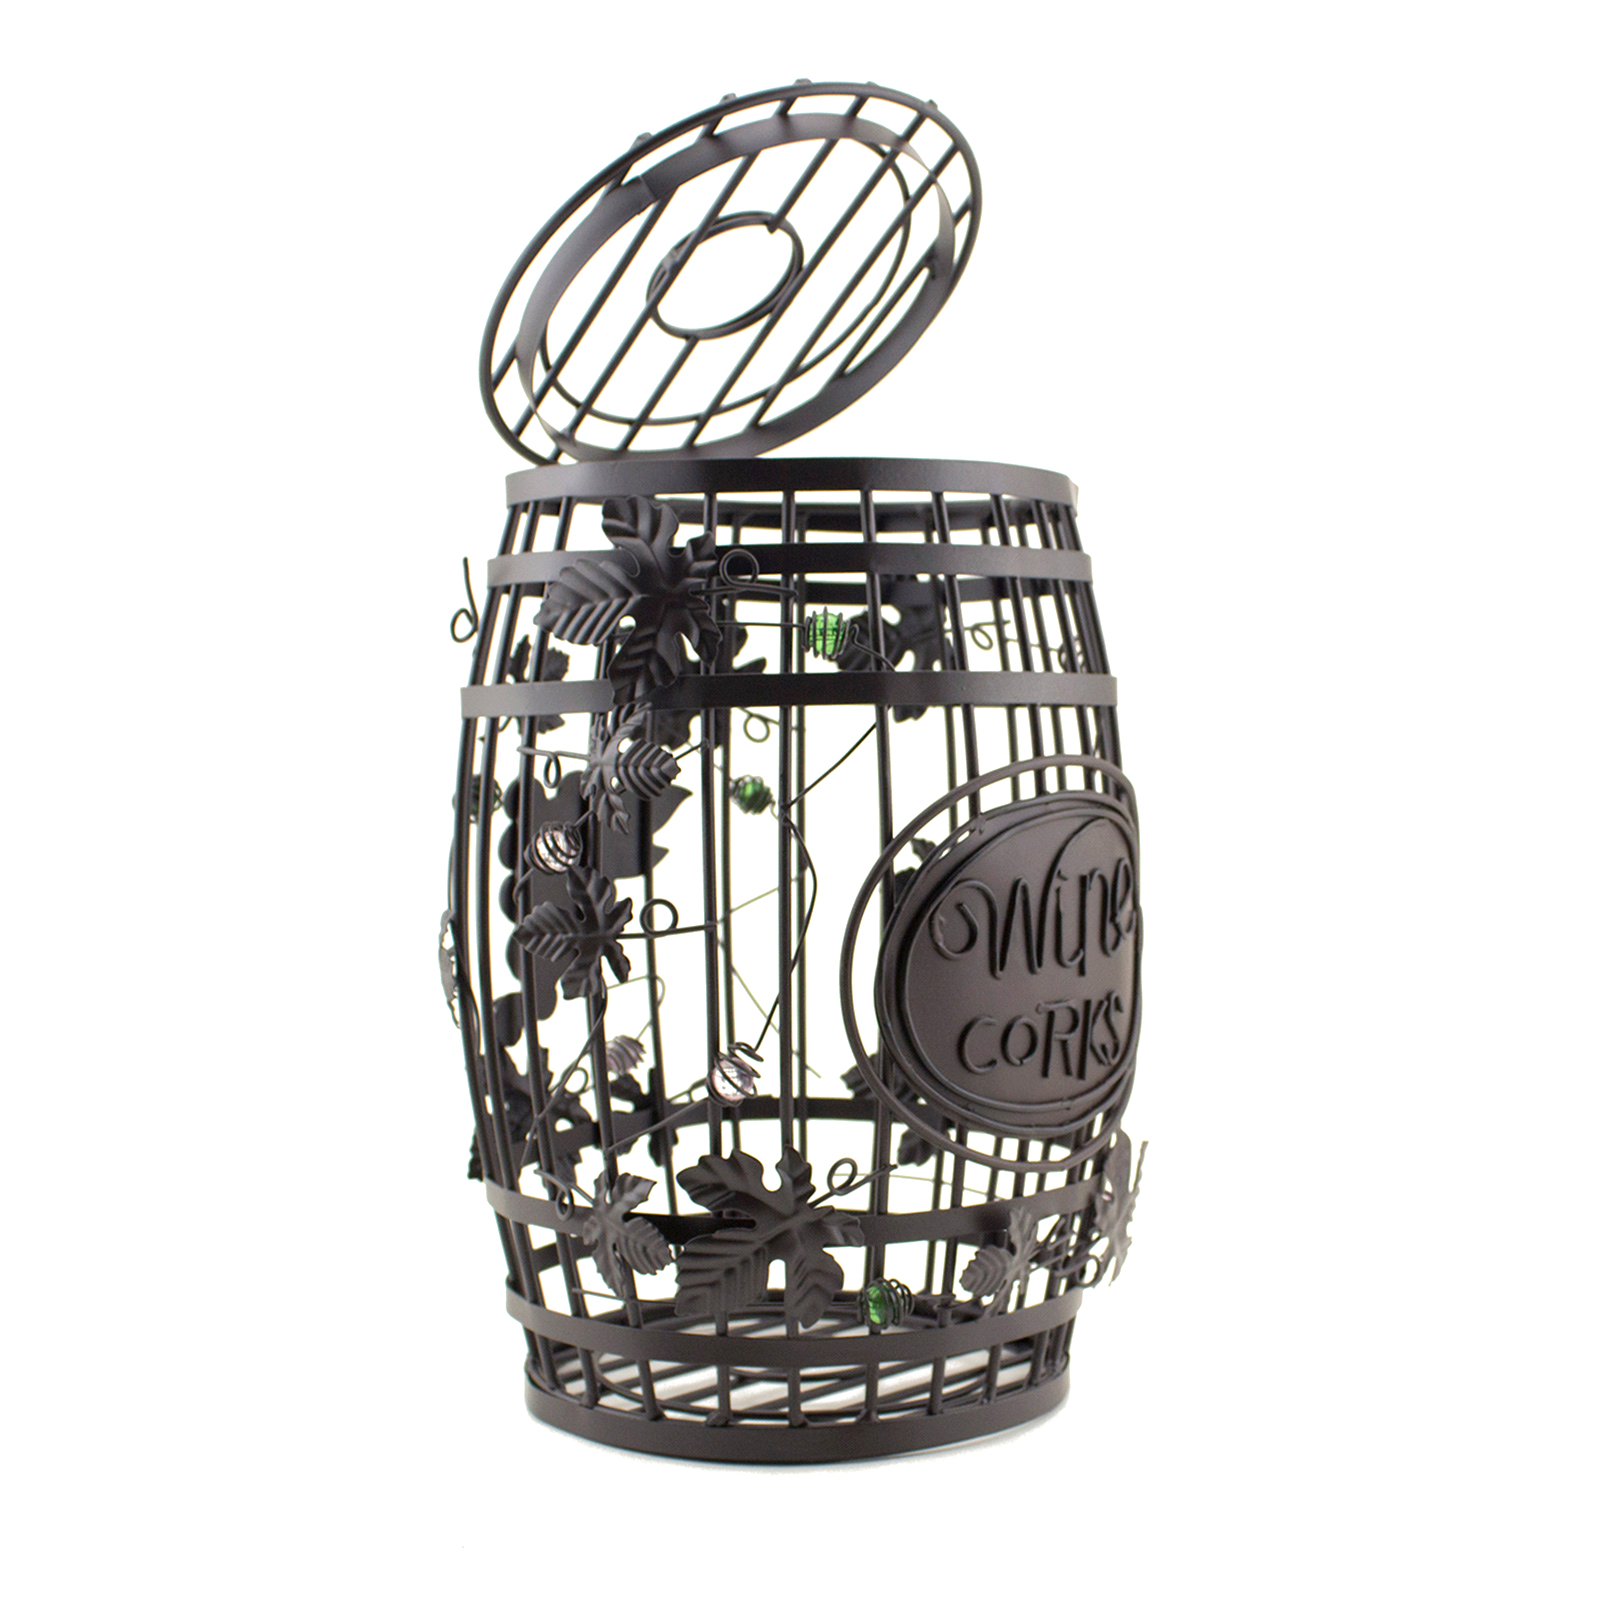 wine barrel cork holder home kitchen decor organization metal barrel cage